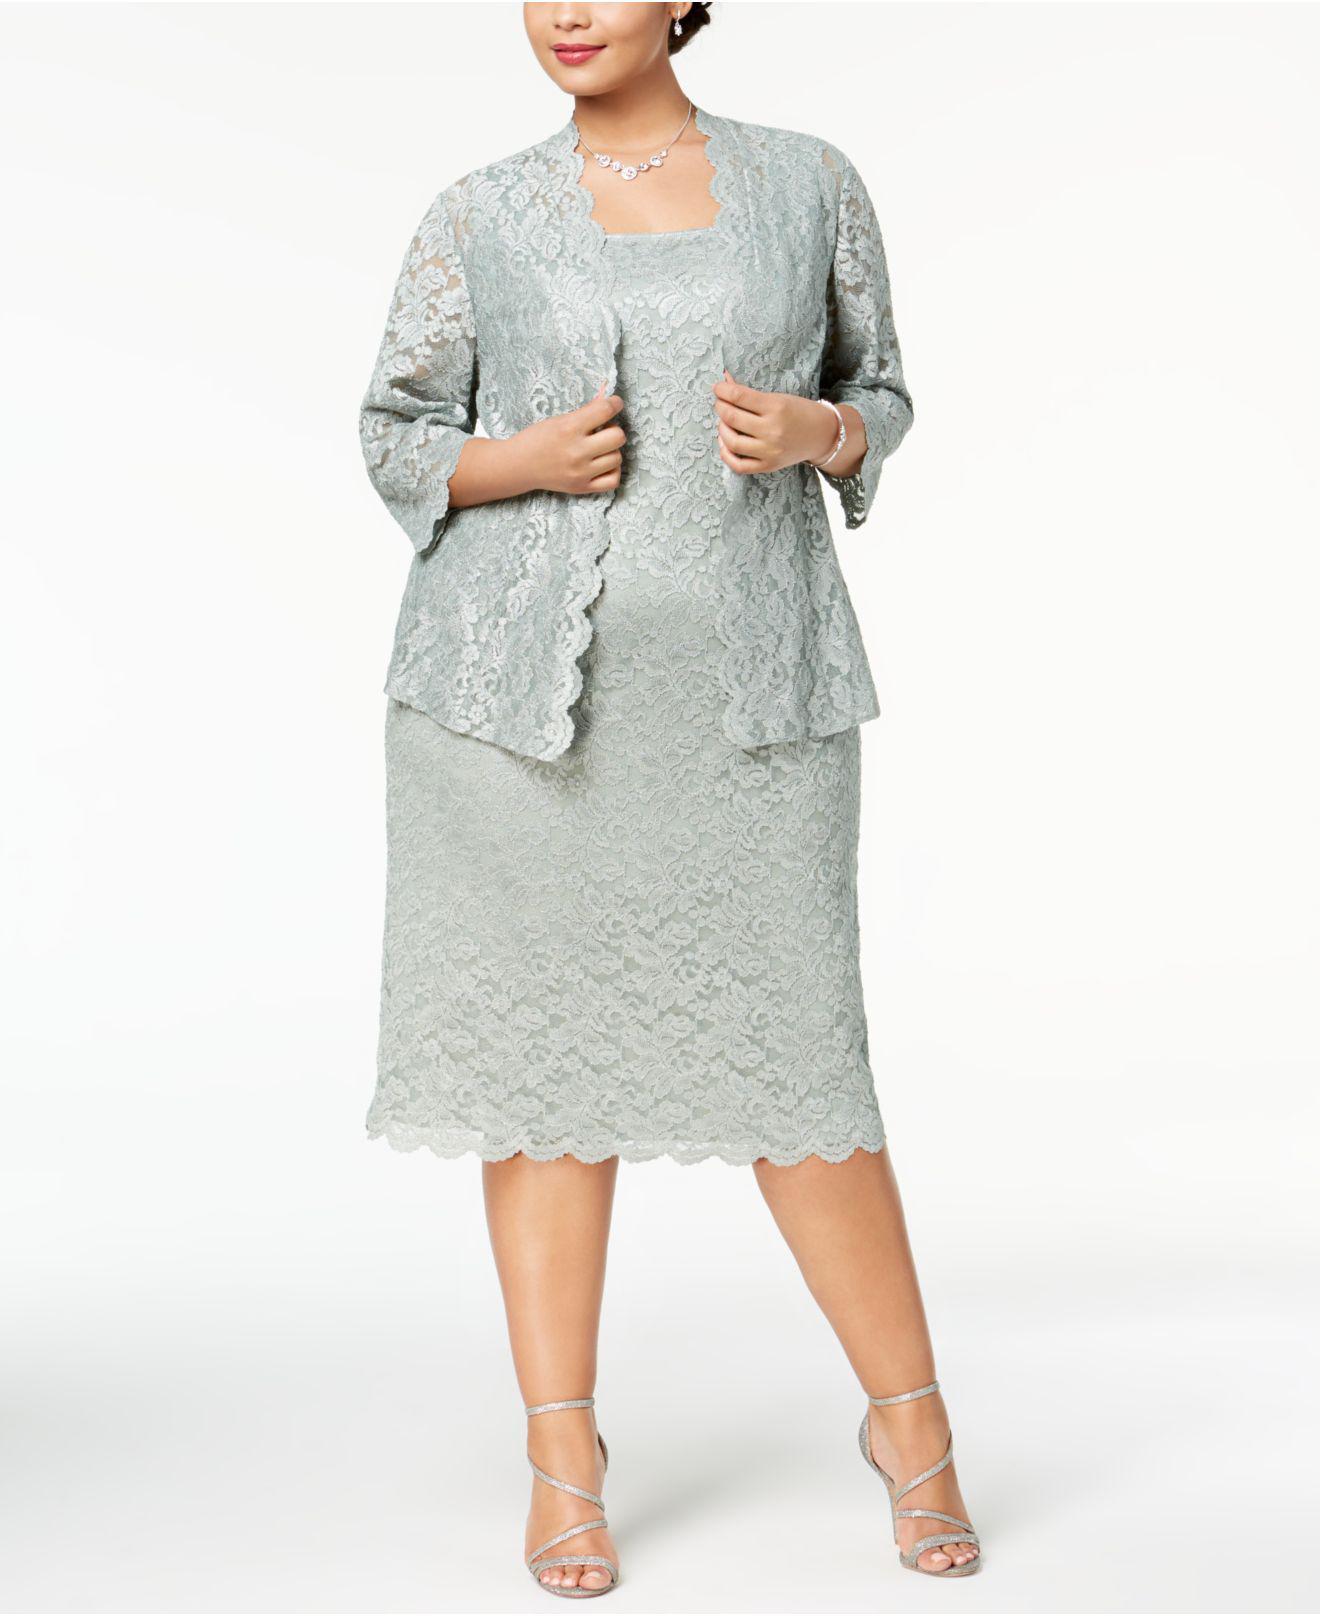 2ad8823a4d2 Lyst - Alex Evenings Plus Size Lace Midi Dress   Jacket